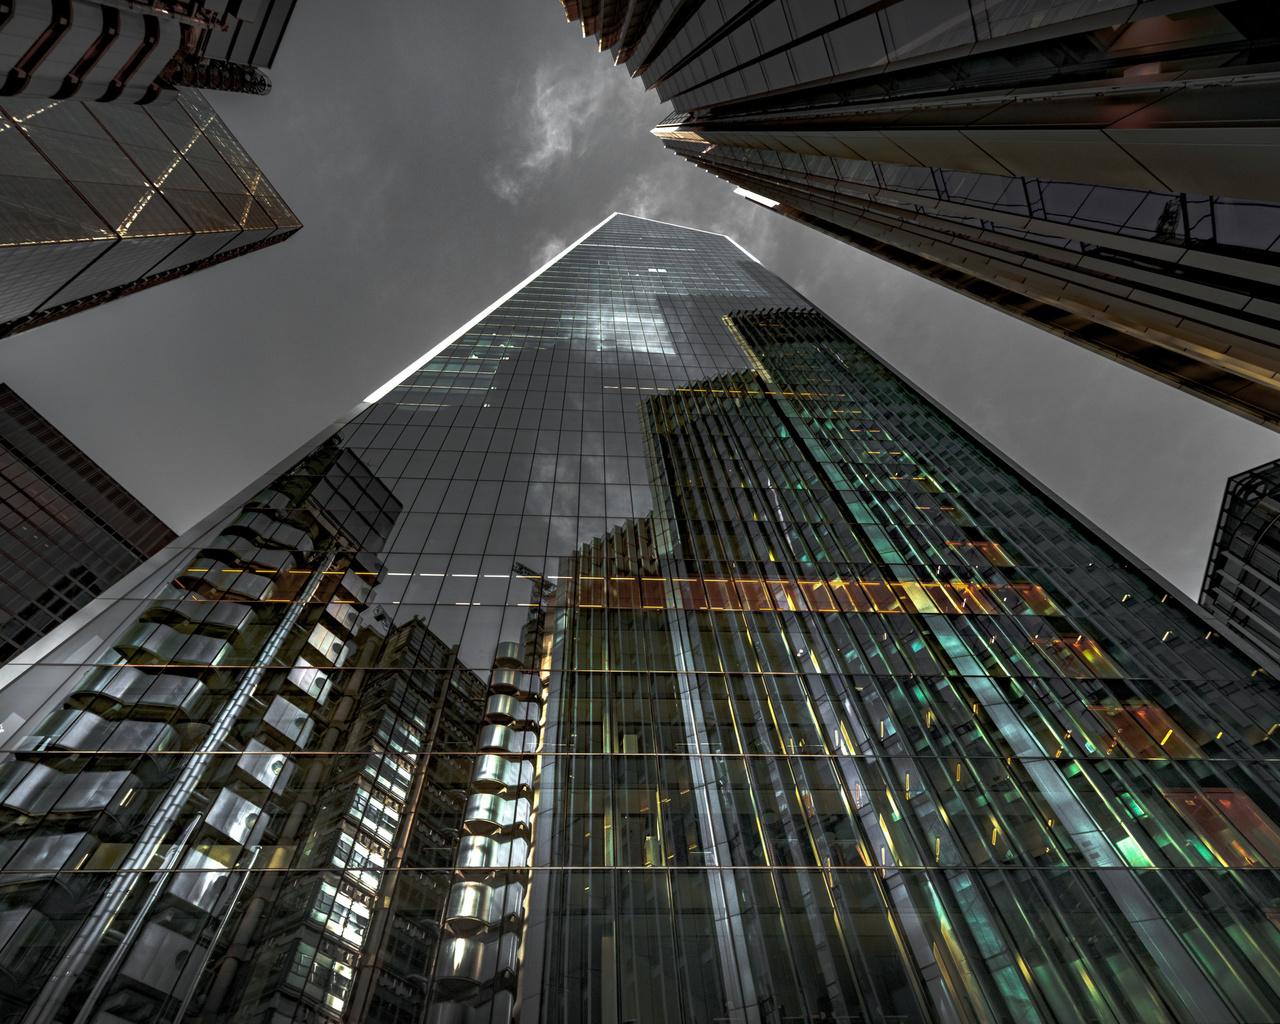 modern business center, glass skyscrapers facade, modern buildings, skyscrapers, beautiful buildings, business centers